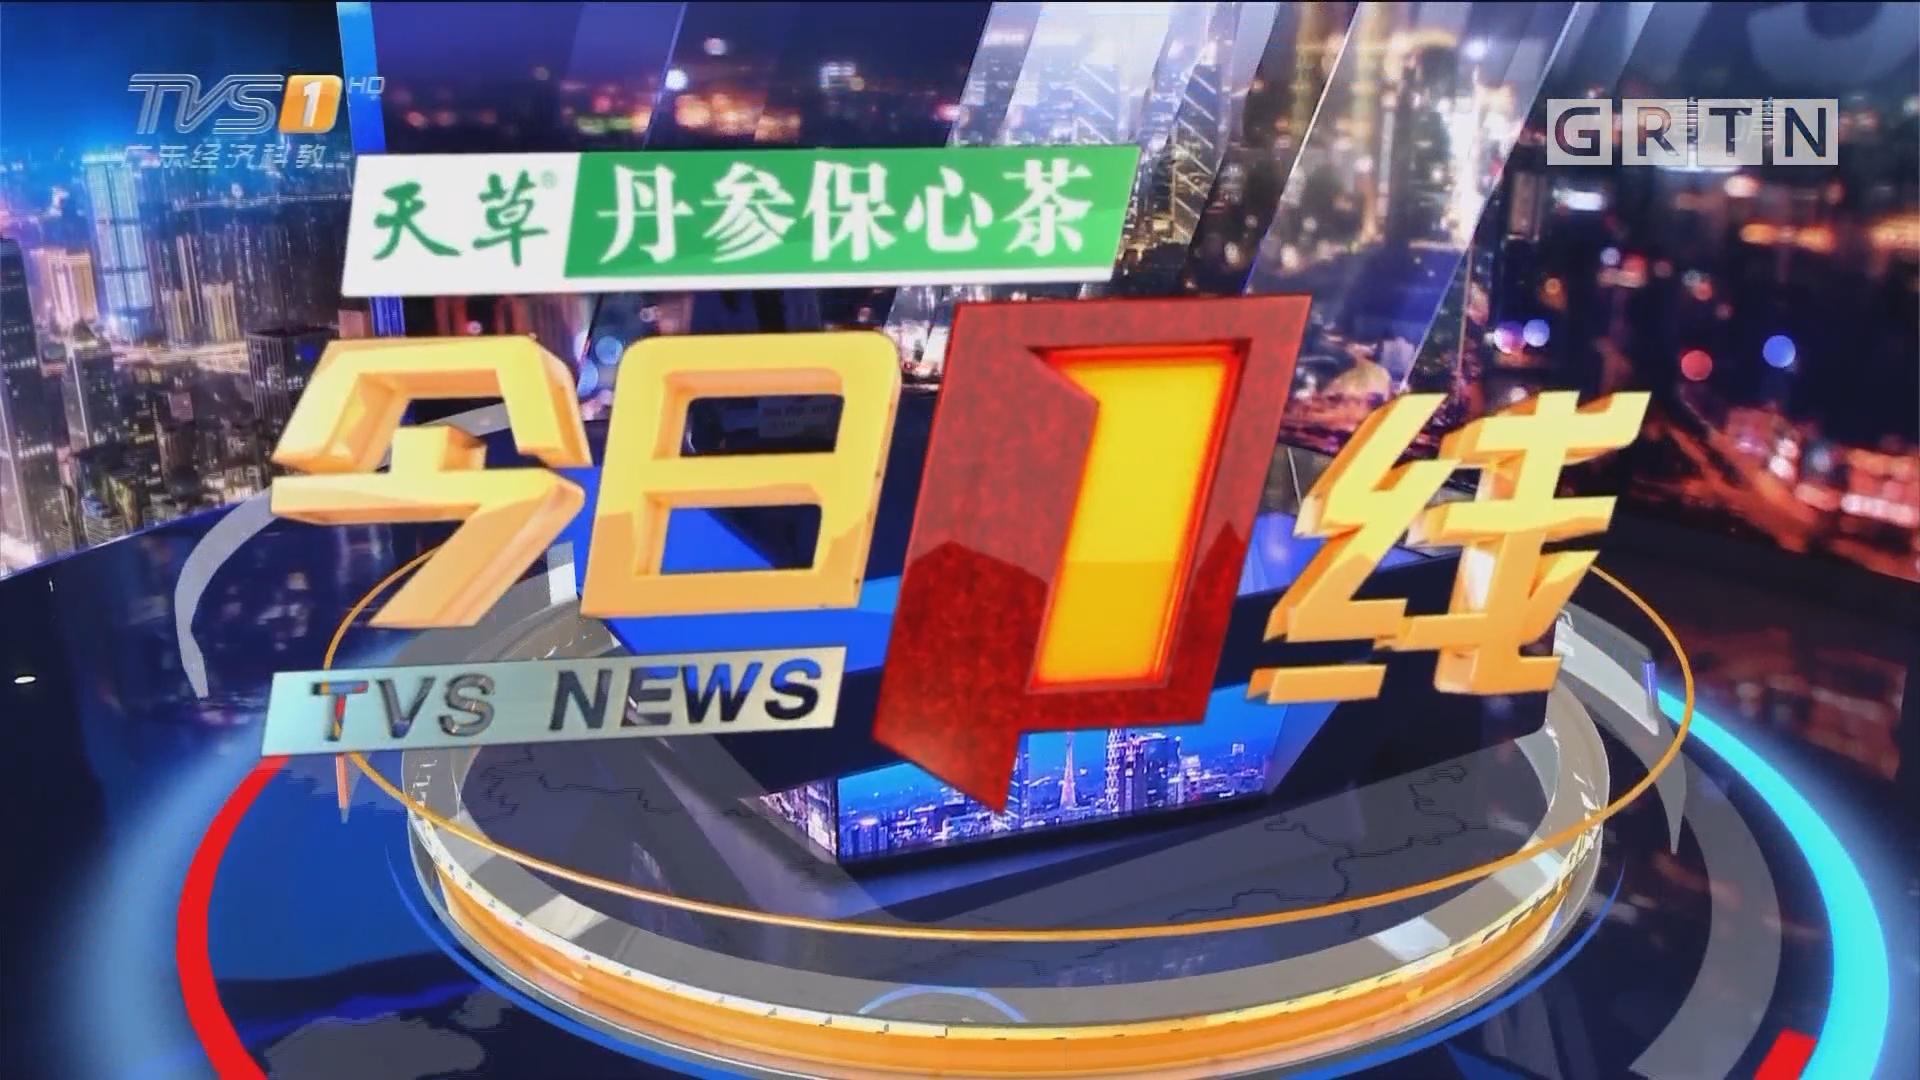 [HD][2018-11-21]今日一线:广州:不分男女幼儿脱掉上衣做操 你怎么看?